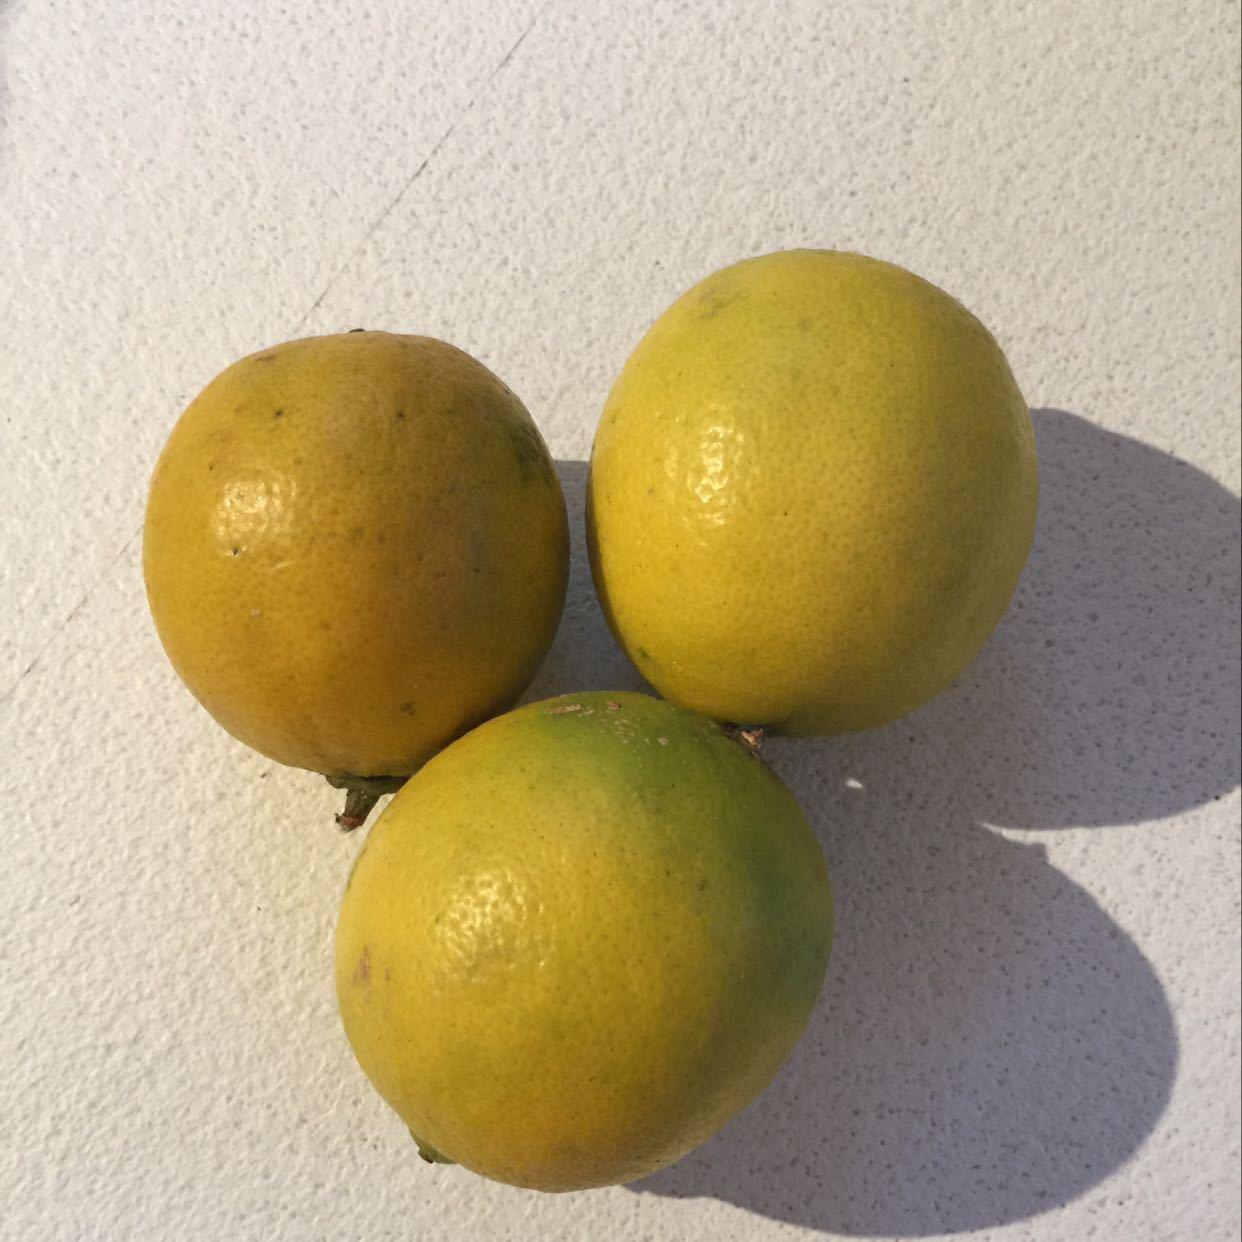 3 limes (not organic)